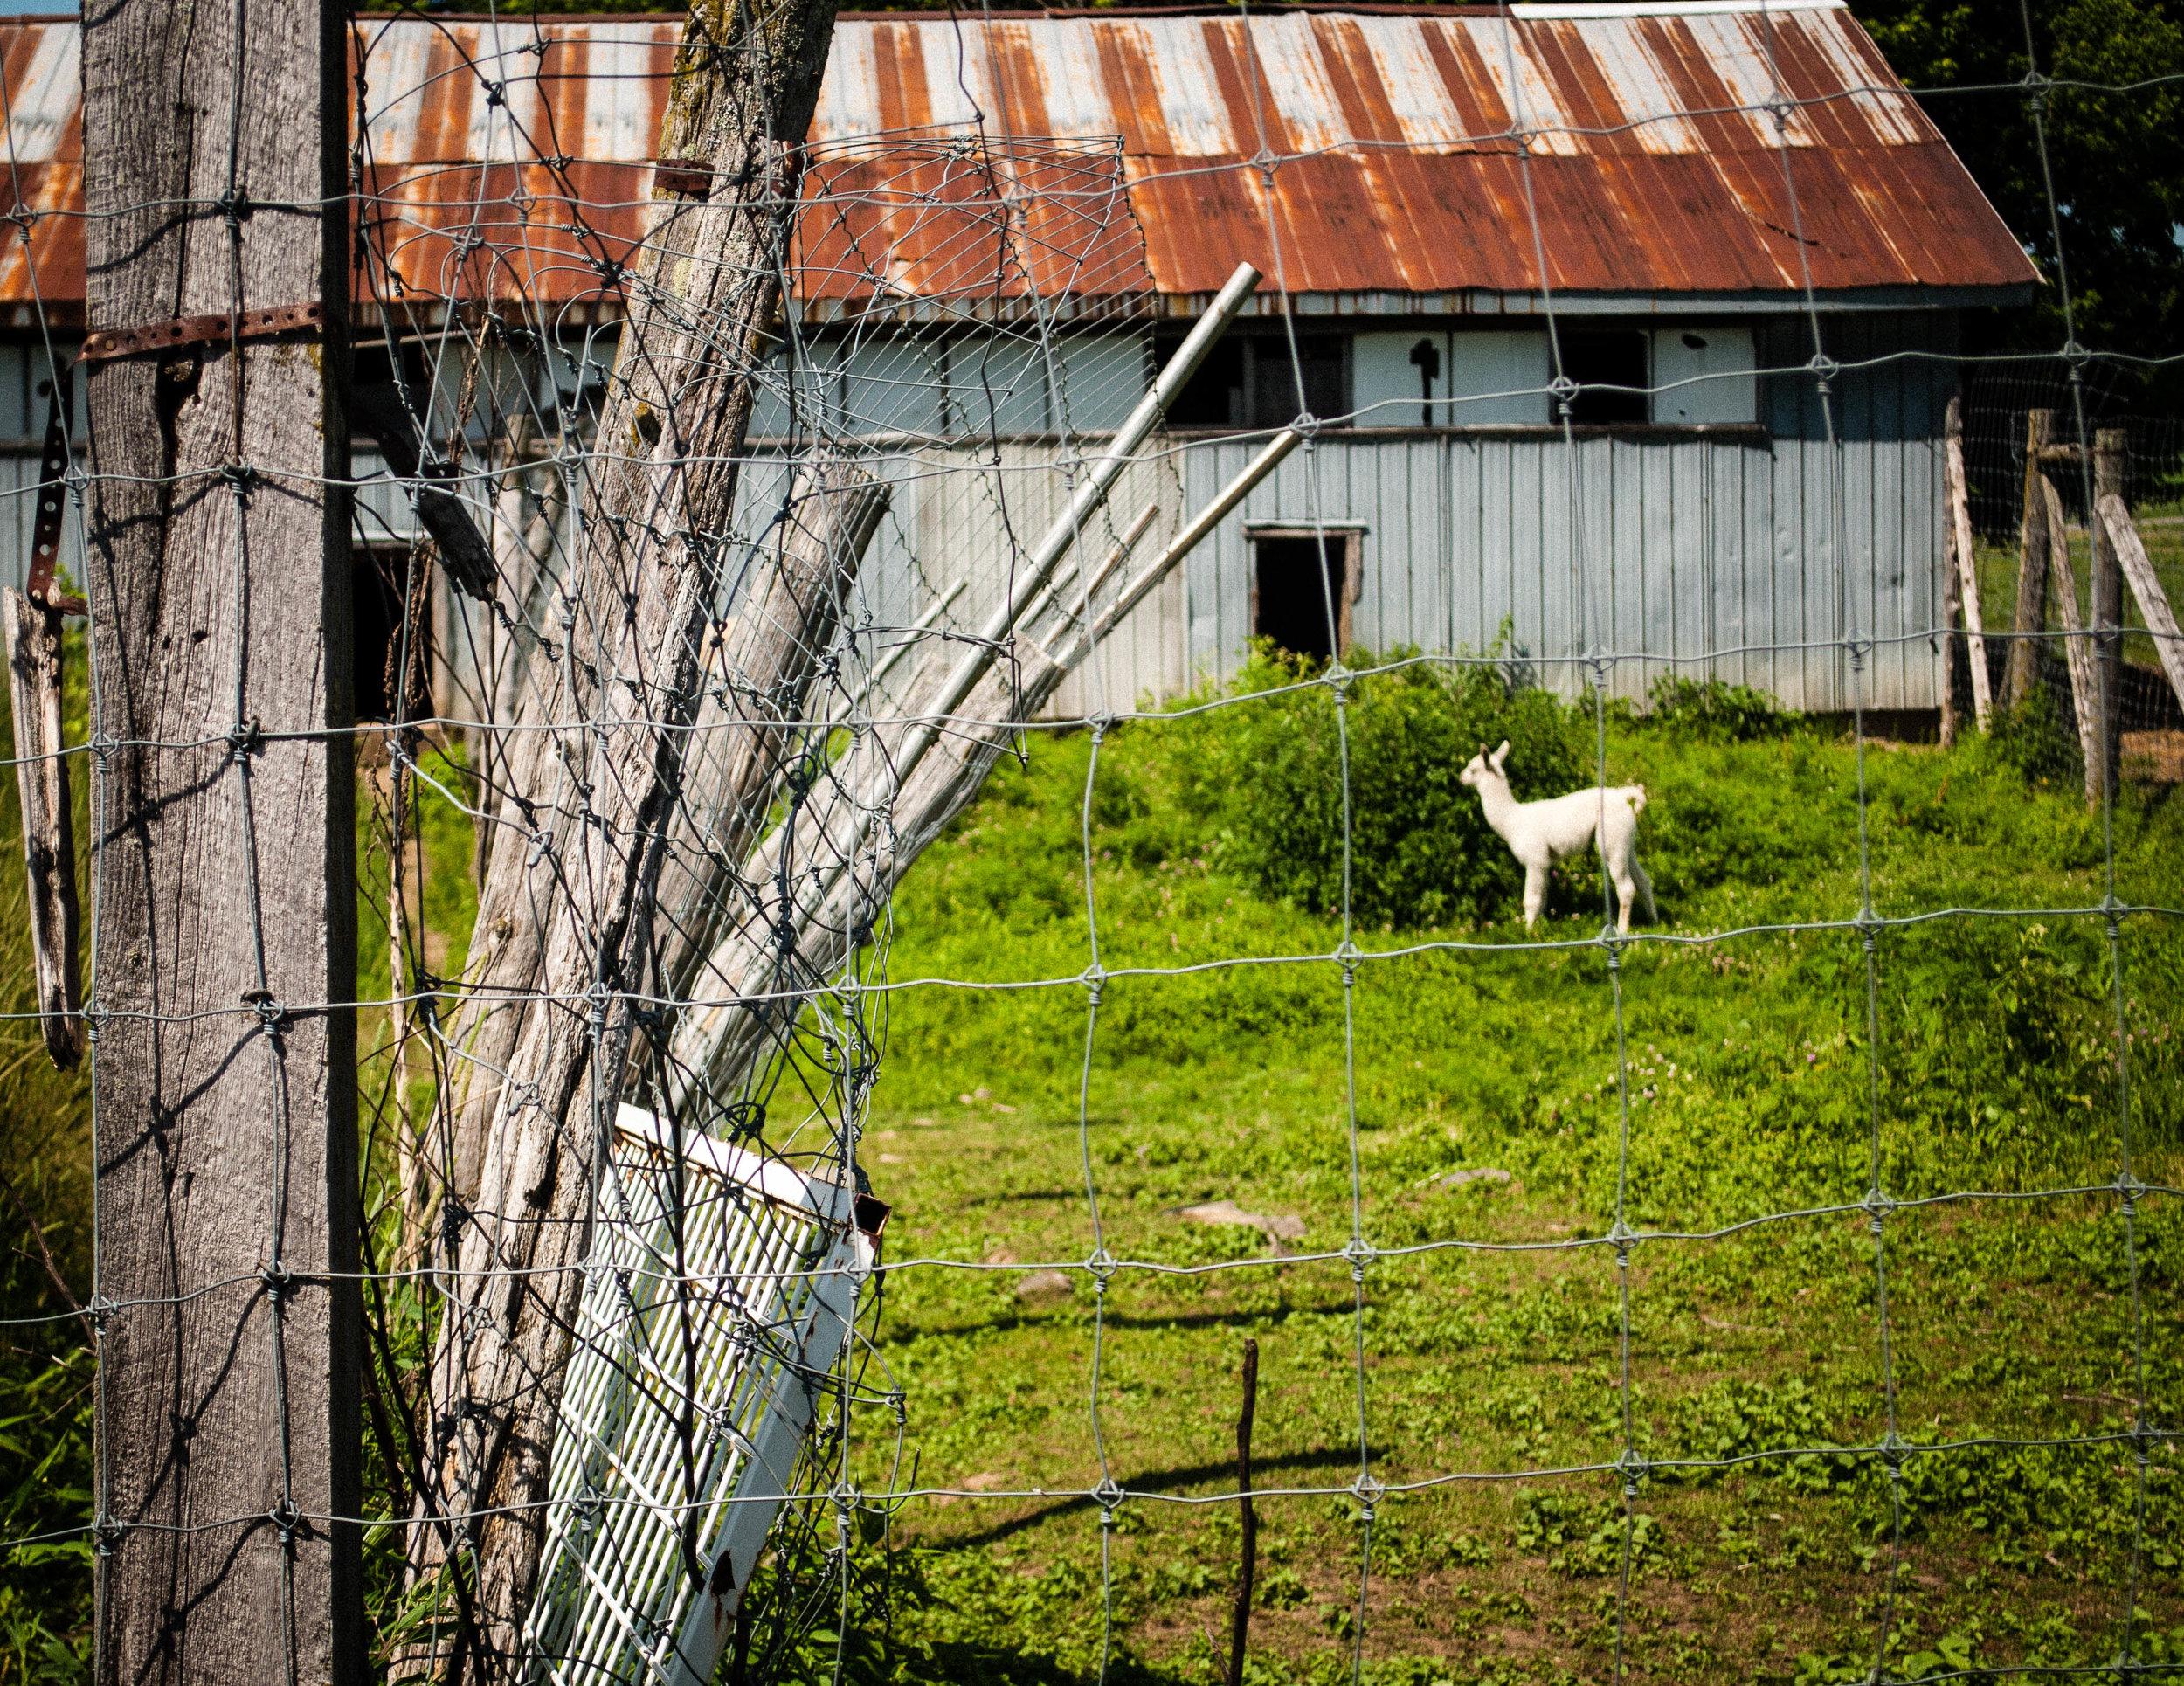 Llama in Vignoble La Bauge